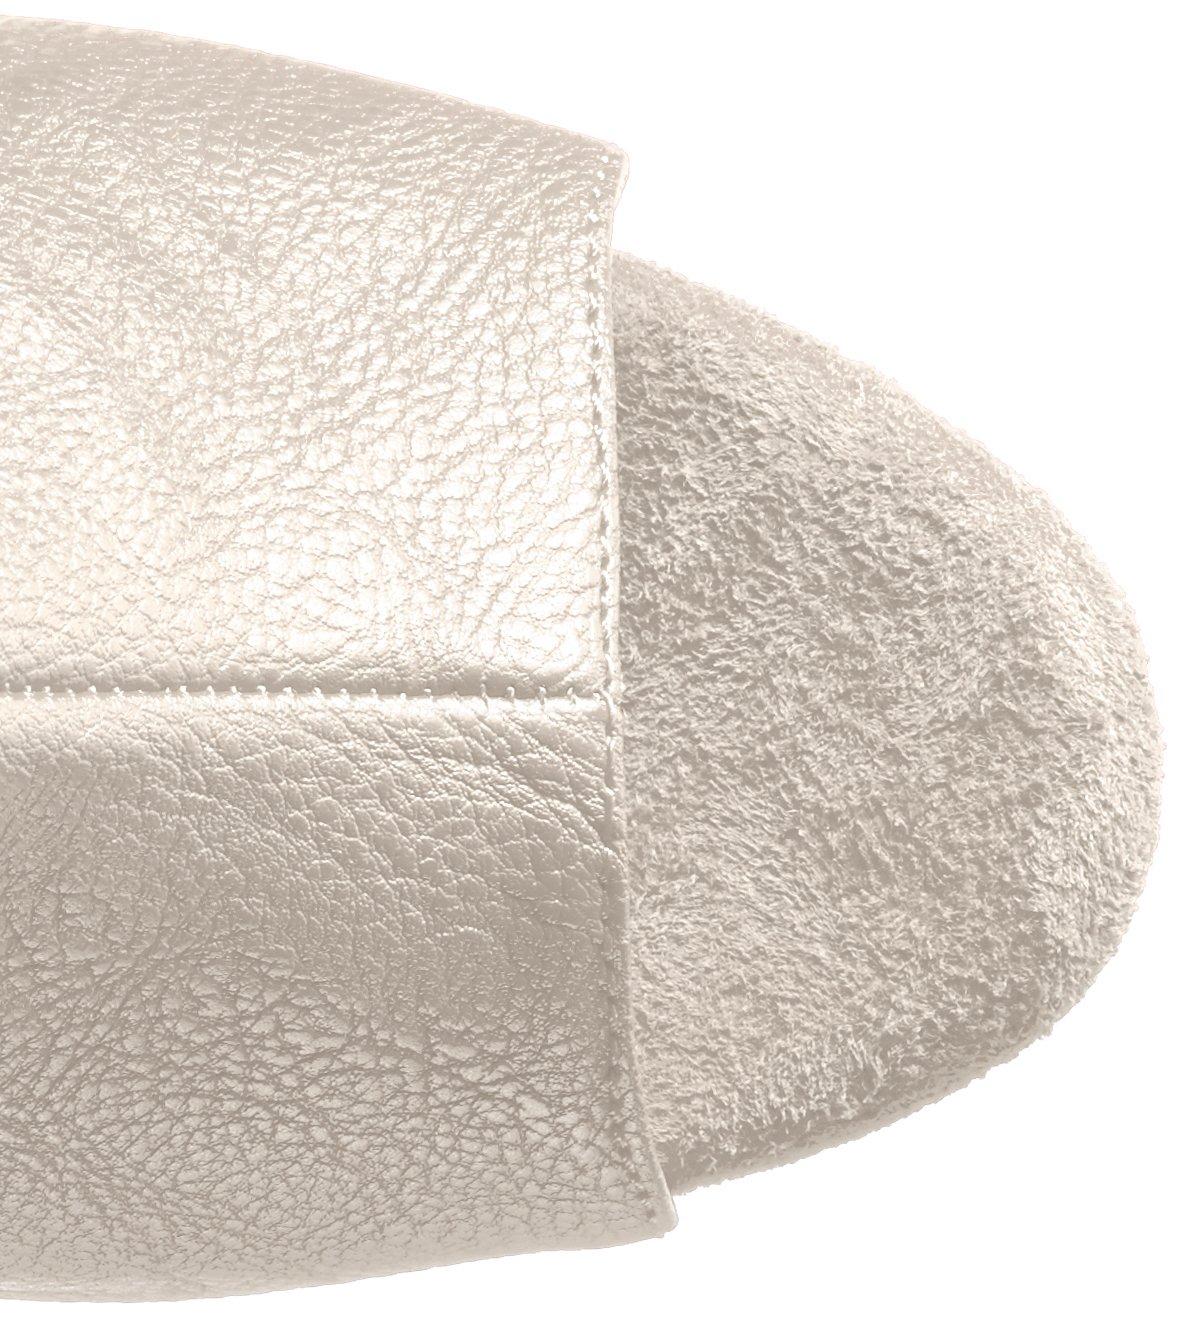 Pleaser Women's Illusion-3019 Over The Knee Boot B01ABTBHSS 10 B(M) US|White Polyurethane/Slv Chrome